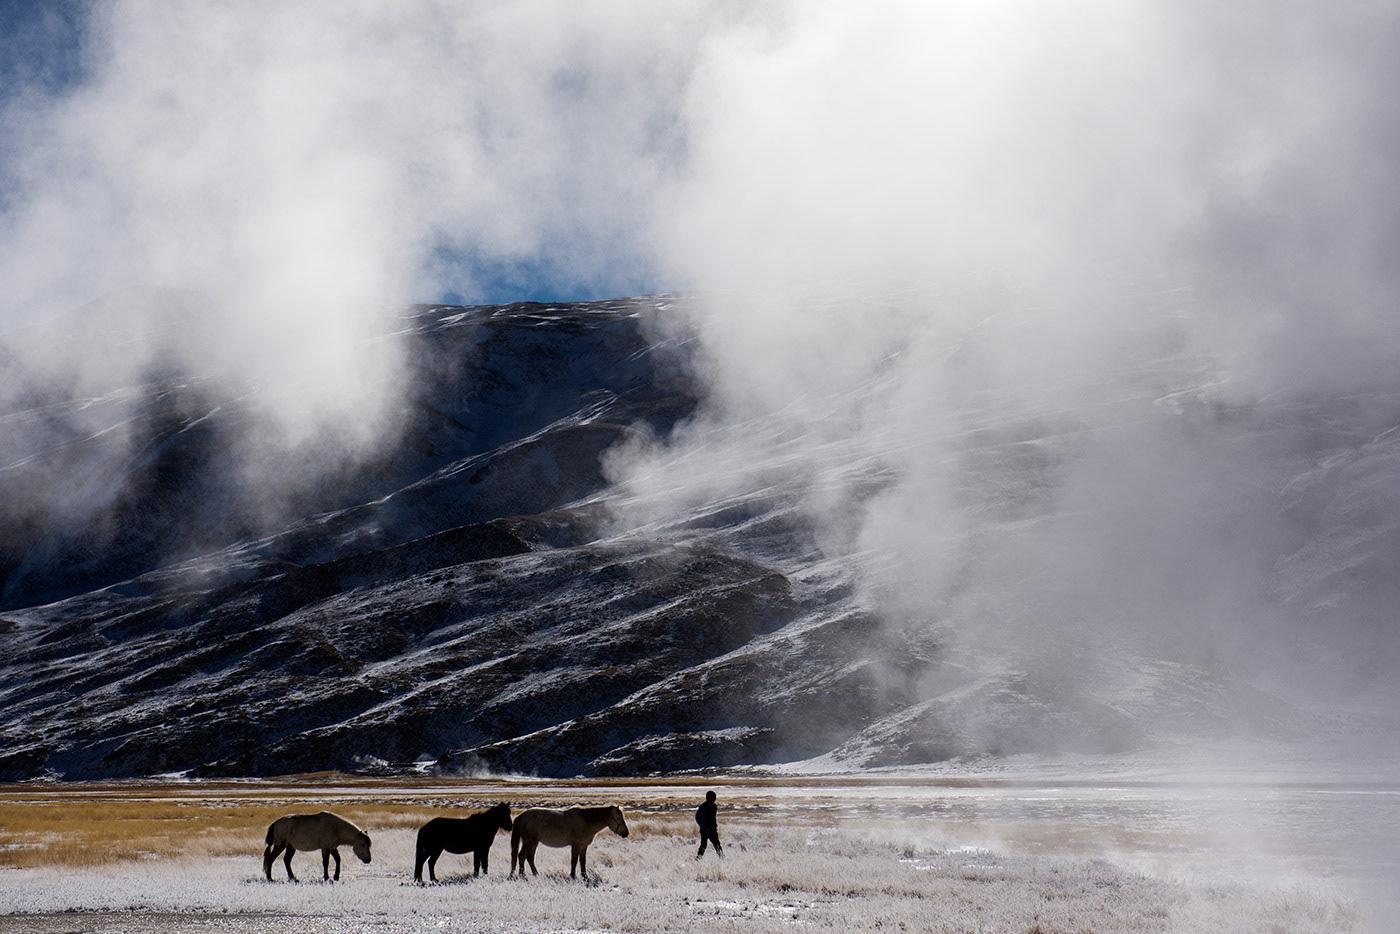 Changpa nomad leads horses through snow in ladakh